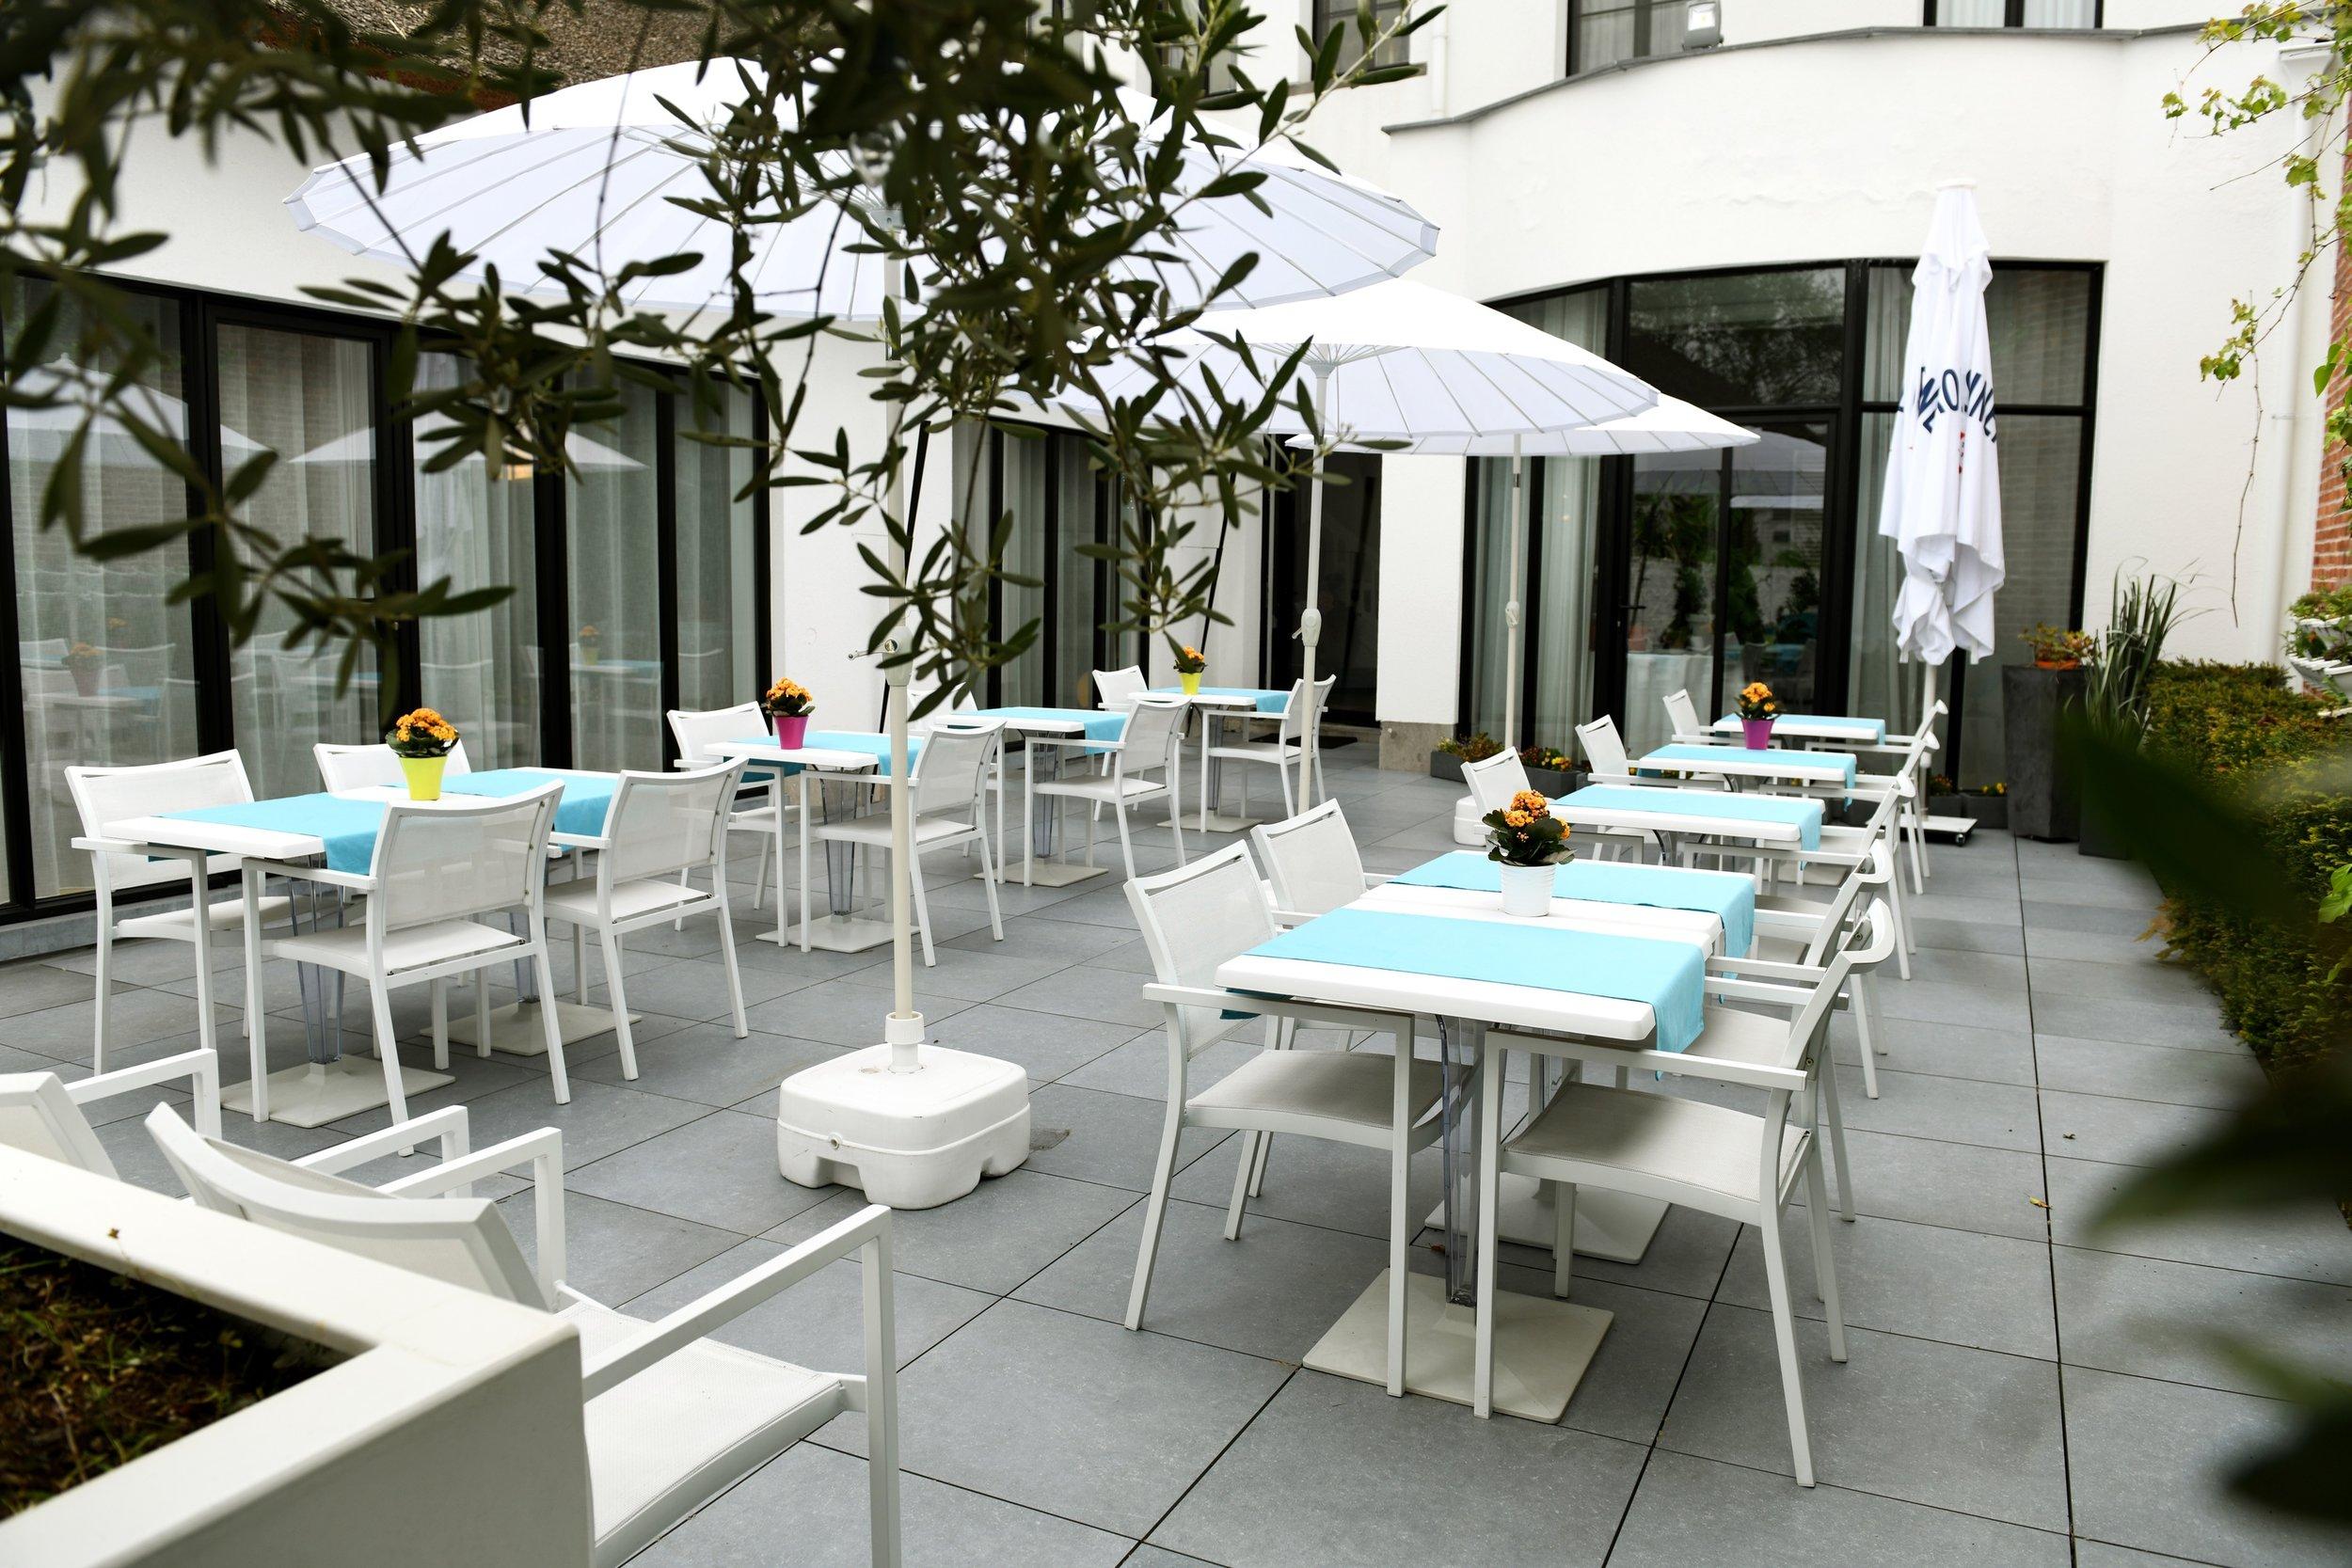 9 restaurant brasserie oud notarishuis ninove bart albrecht tablefever .jpg